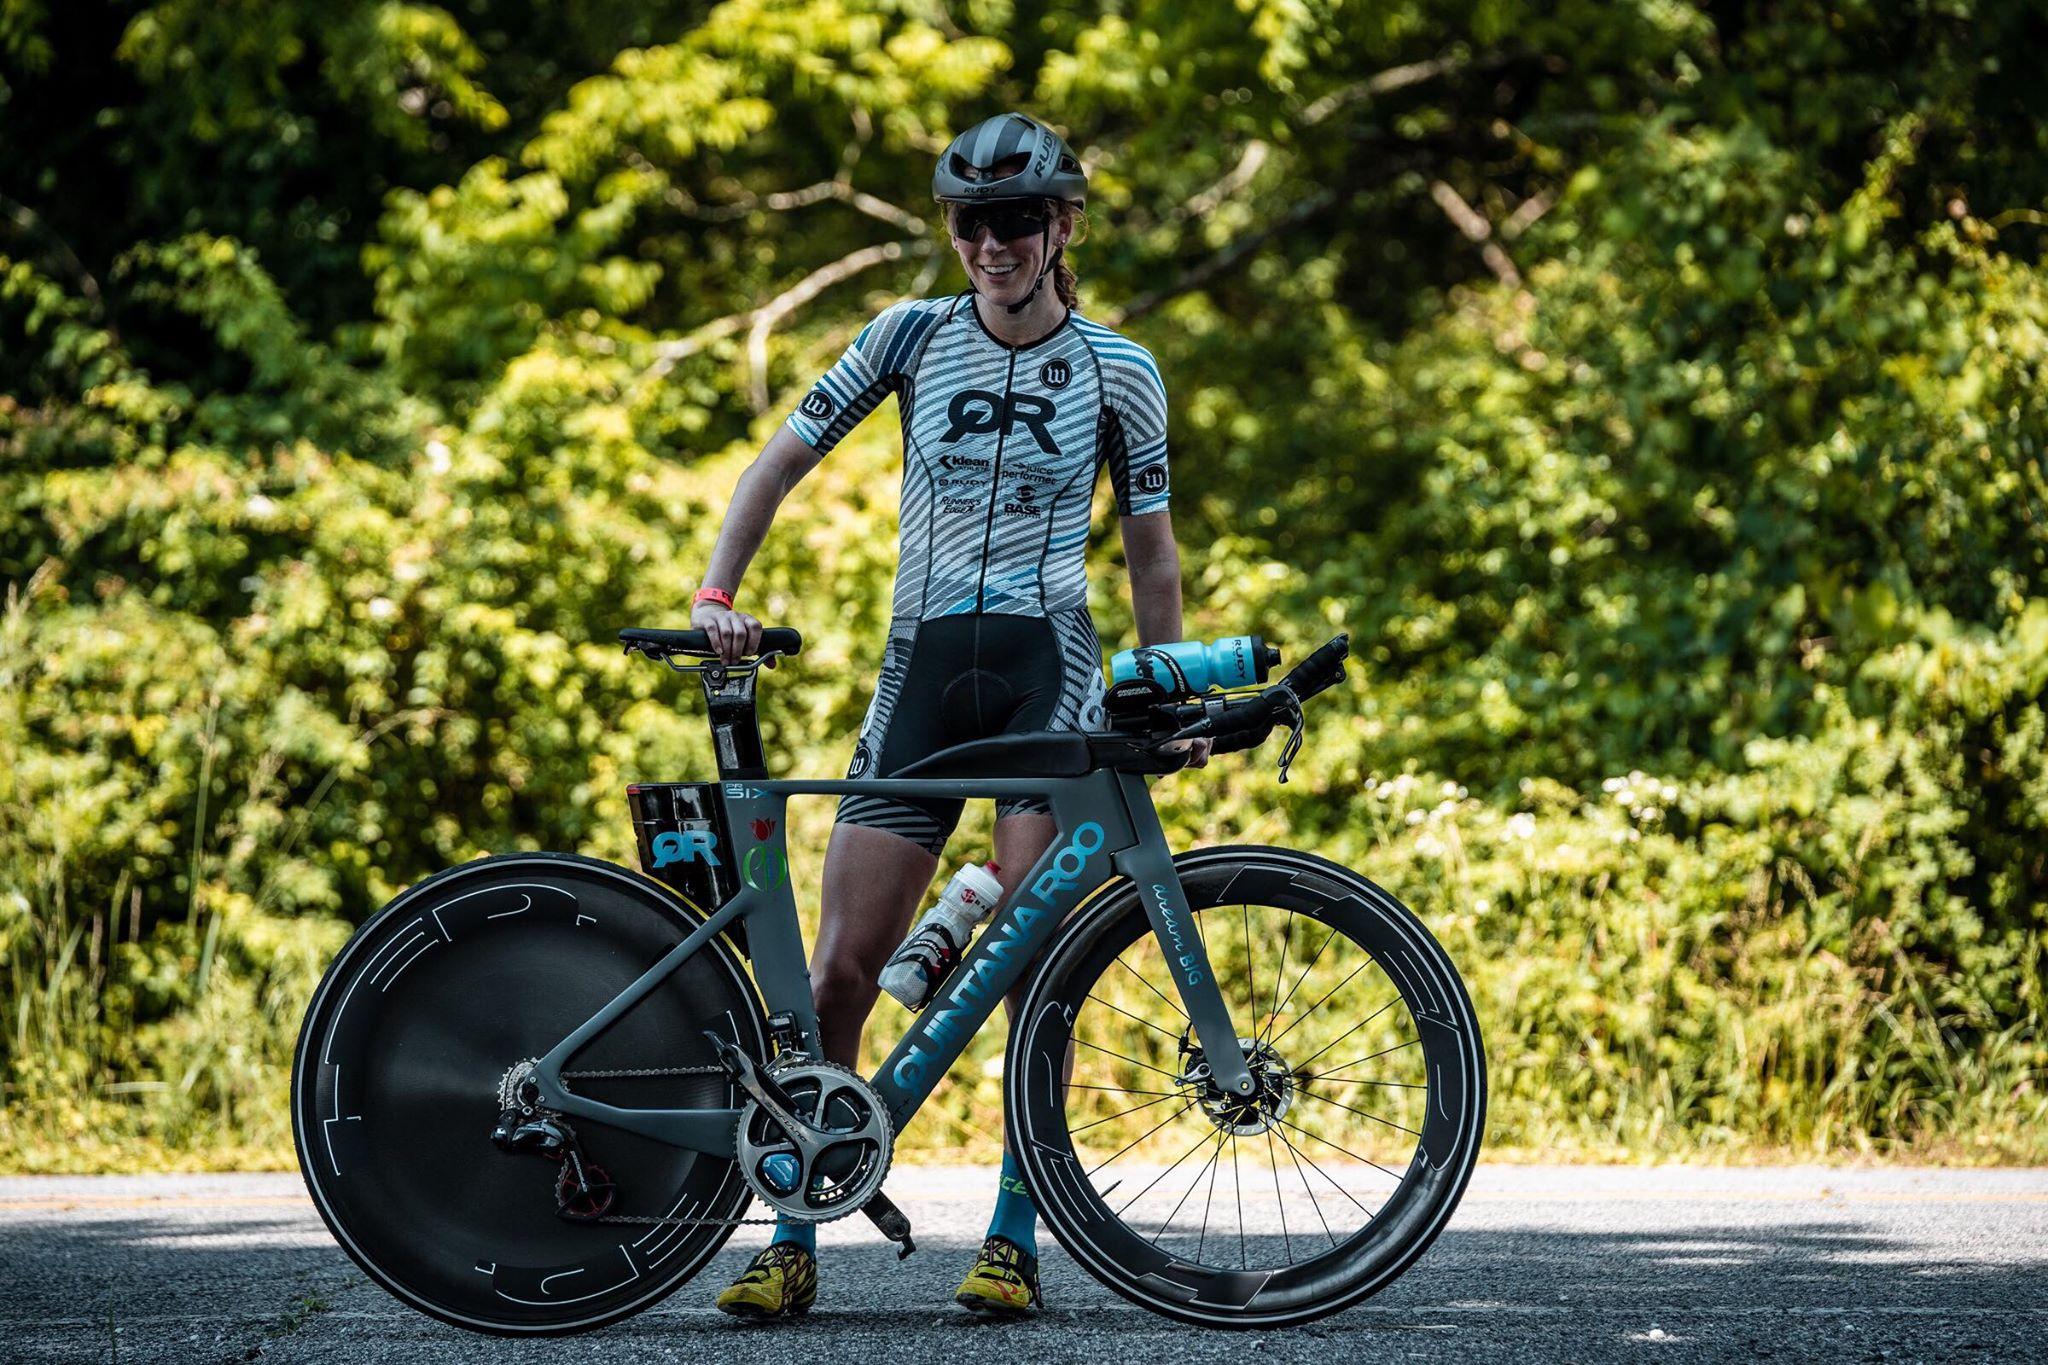 Coach_Terry_Wilson_Pursuit_of_The_Perfect_Race_IRONMAN_Canada_Jodie_Robertson_bike.jpg